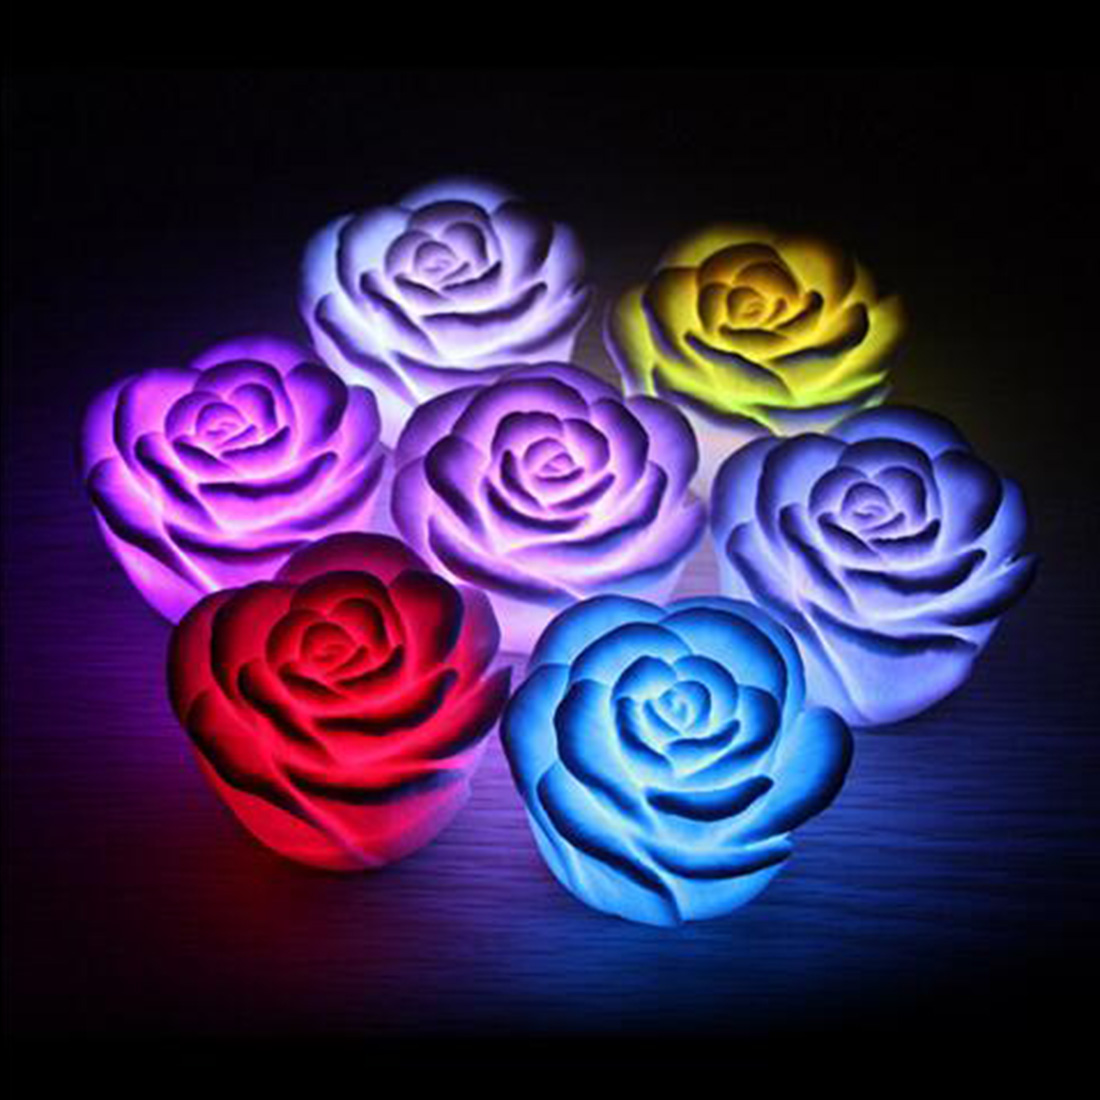 LED Night Lamp Romantic Rose Flower Night Light Color Changed Lamp LED Night Lights Interior Design